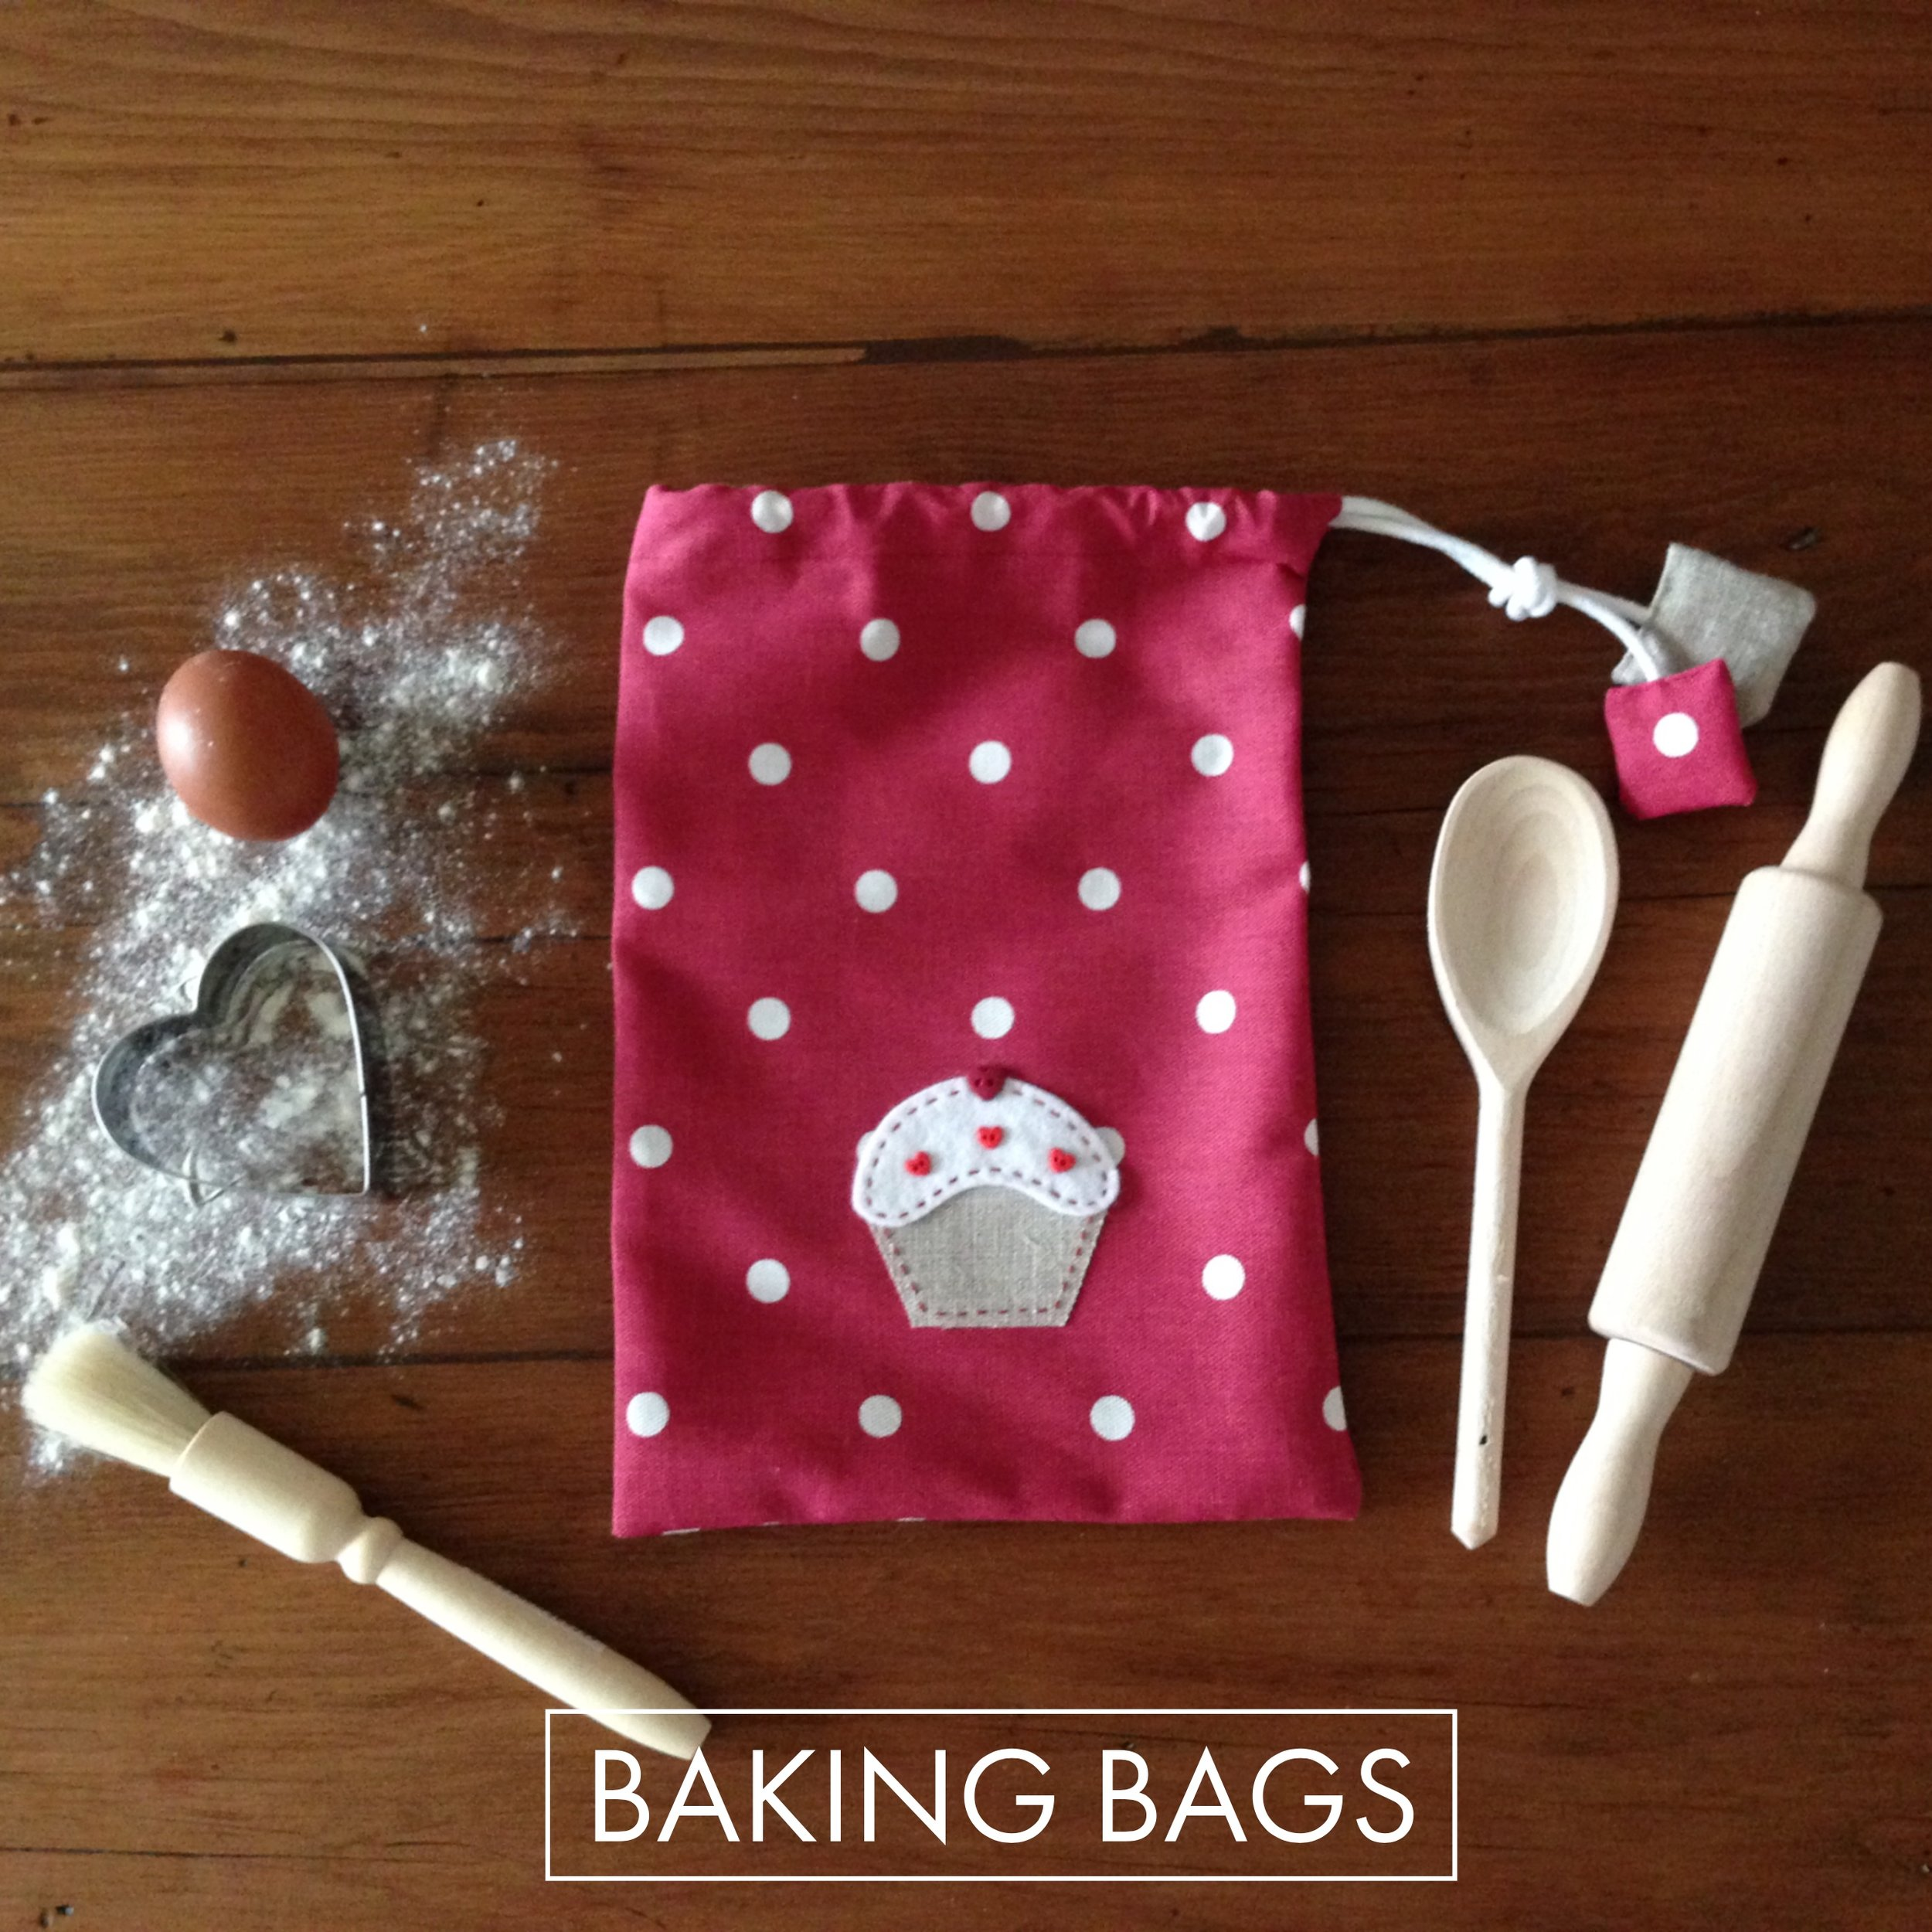 Category Baking Bags.jpg